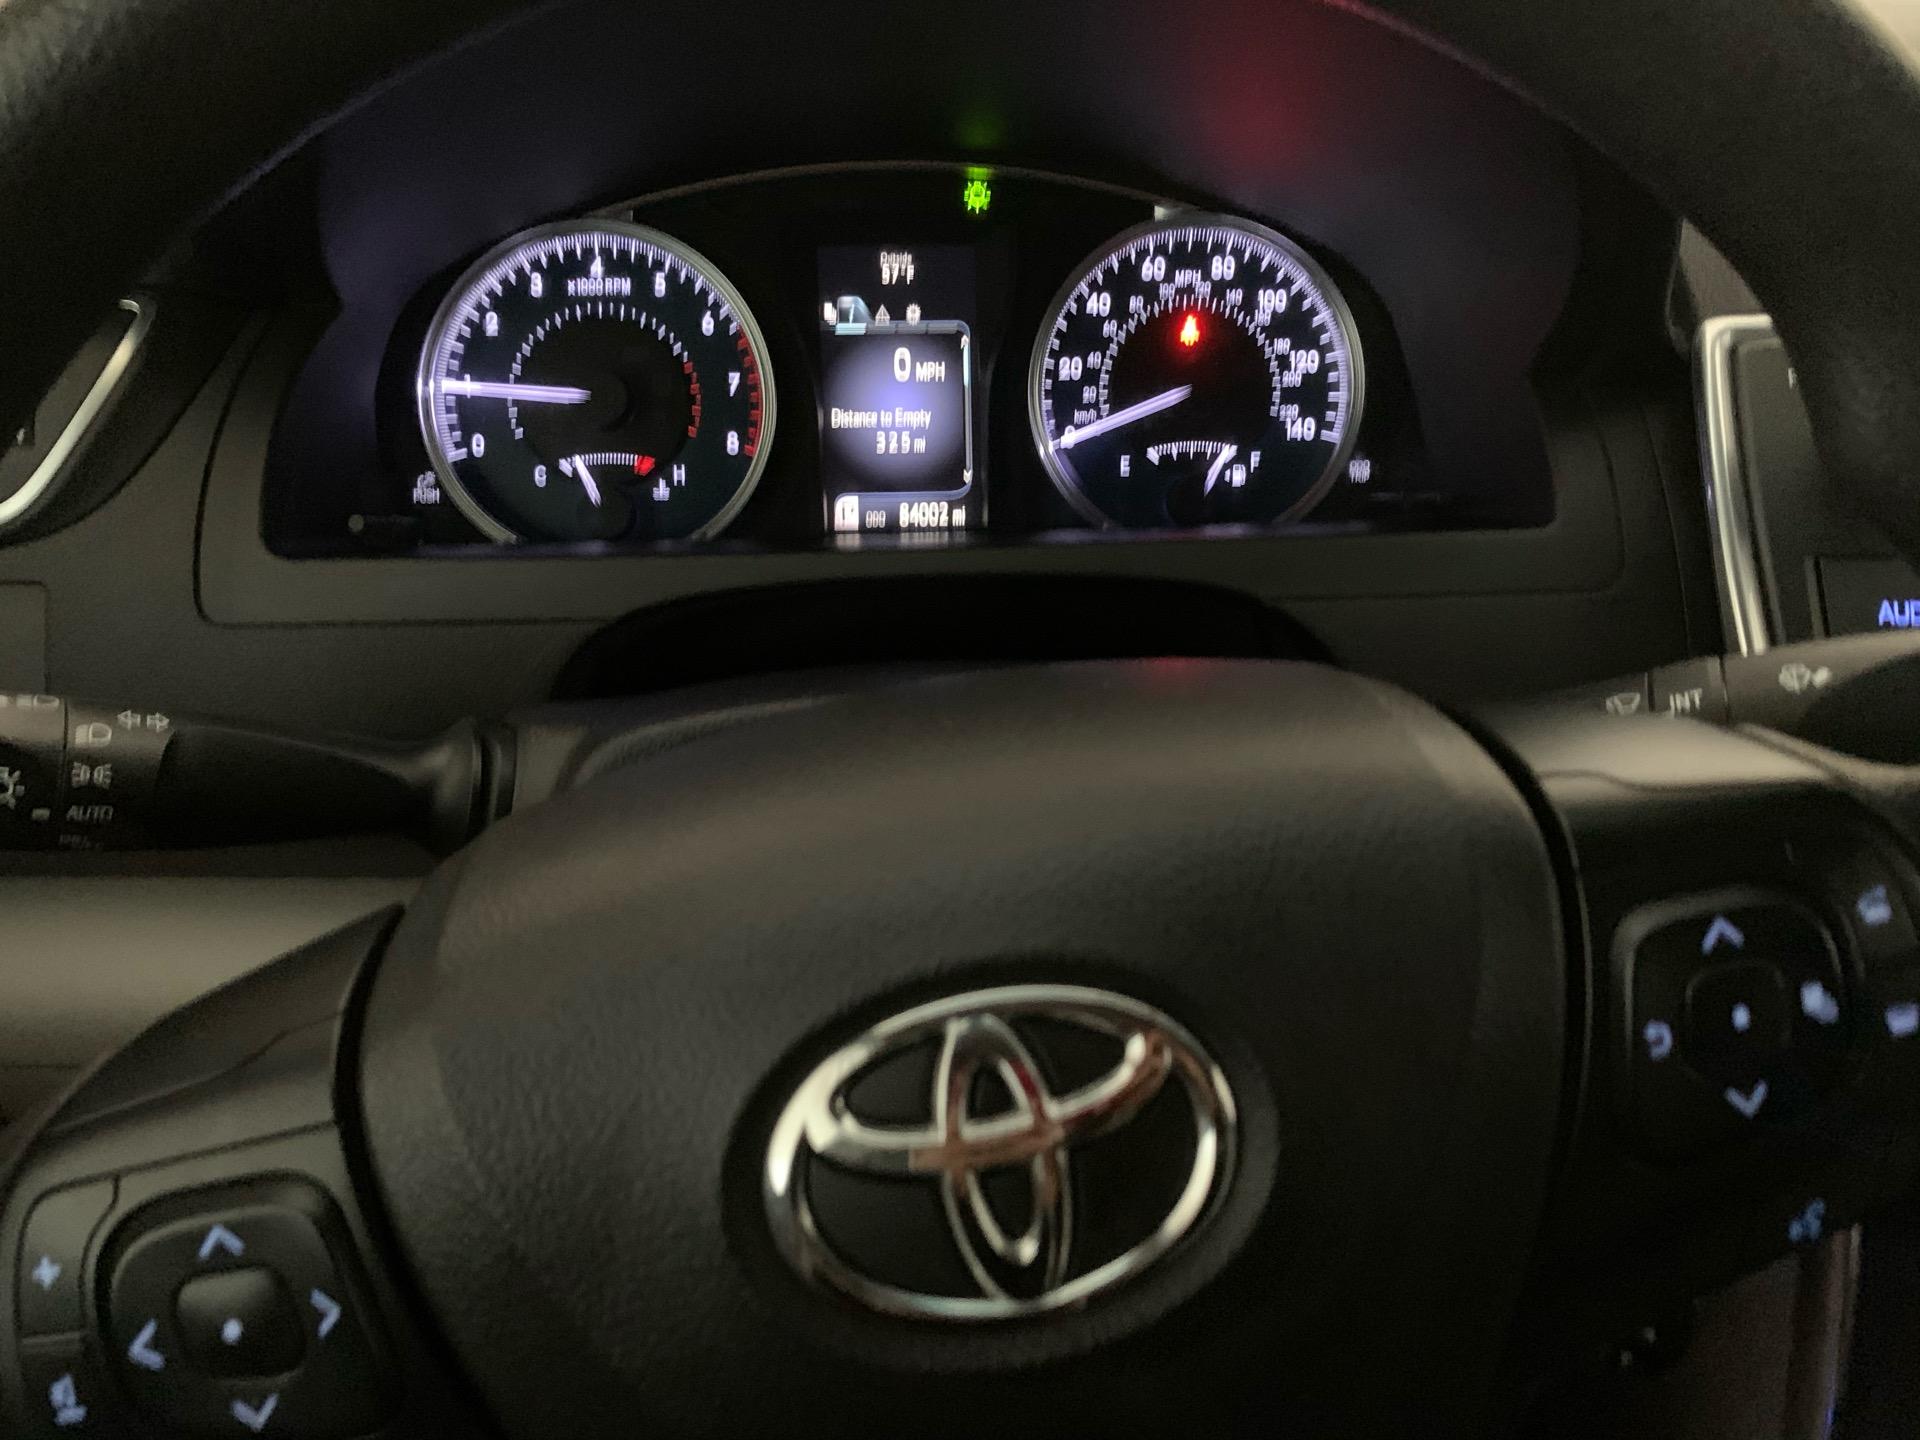 2016 Toyota Camry - photo 1